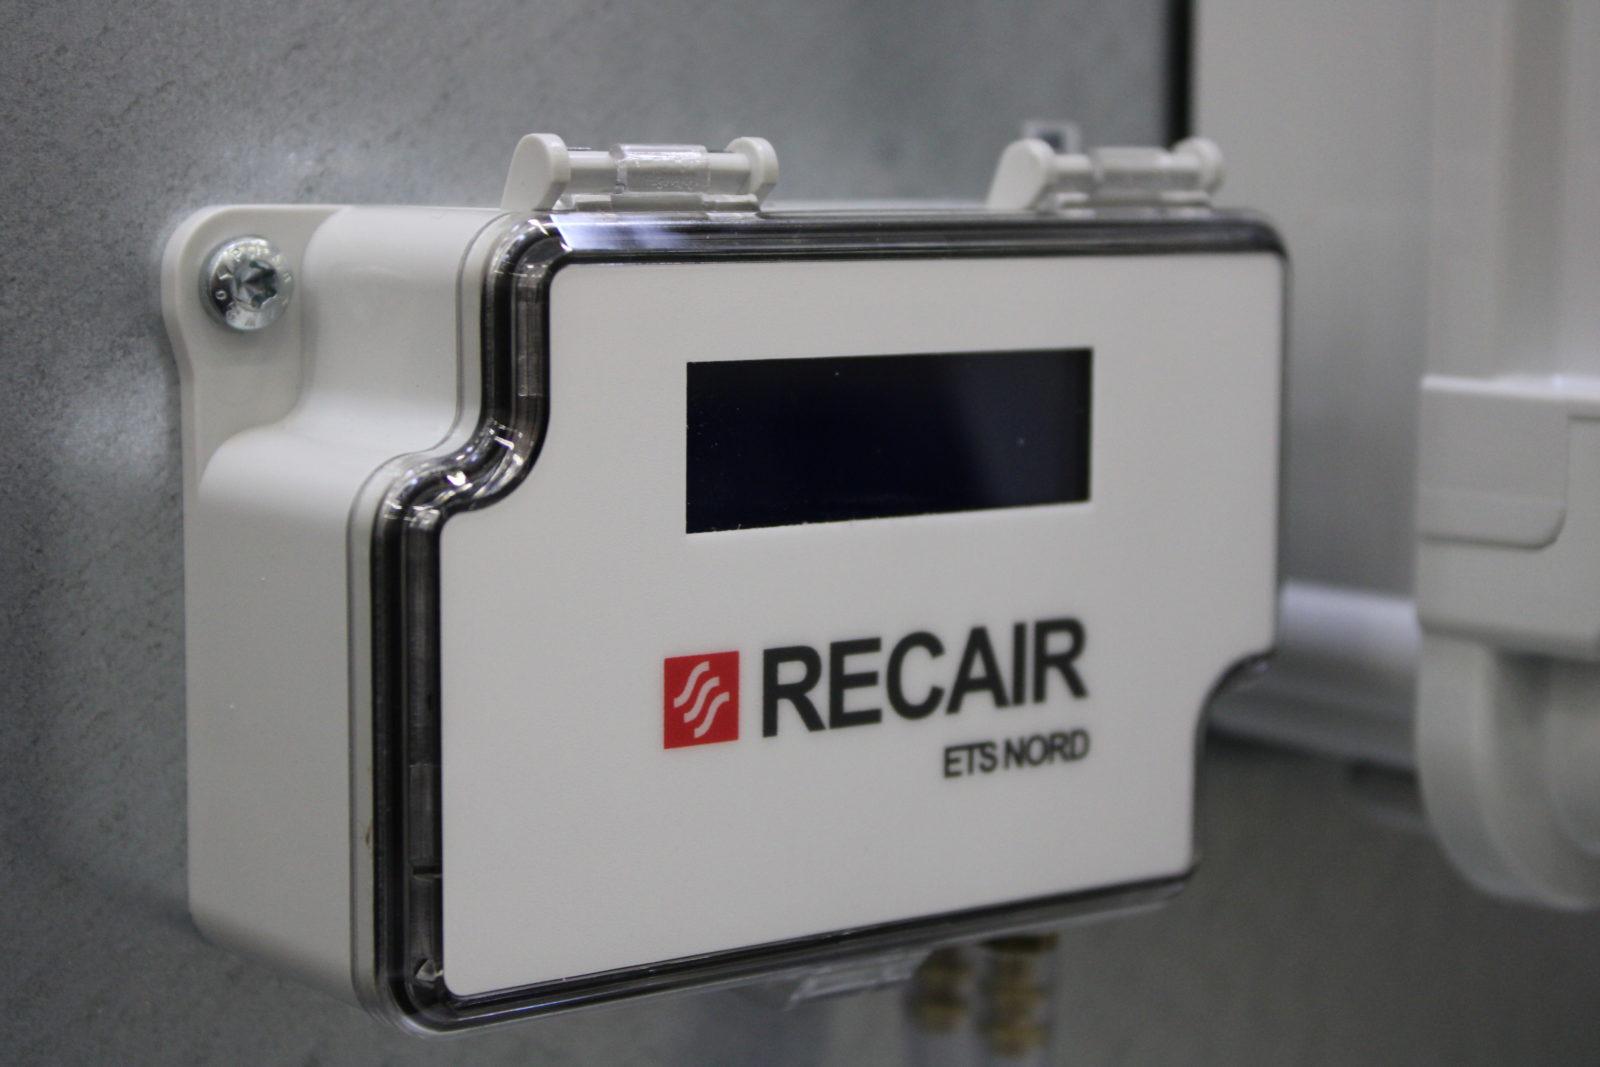 Recair